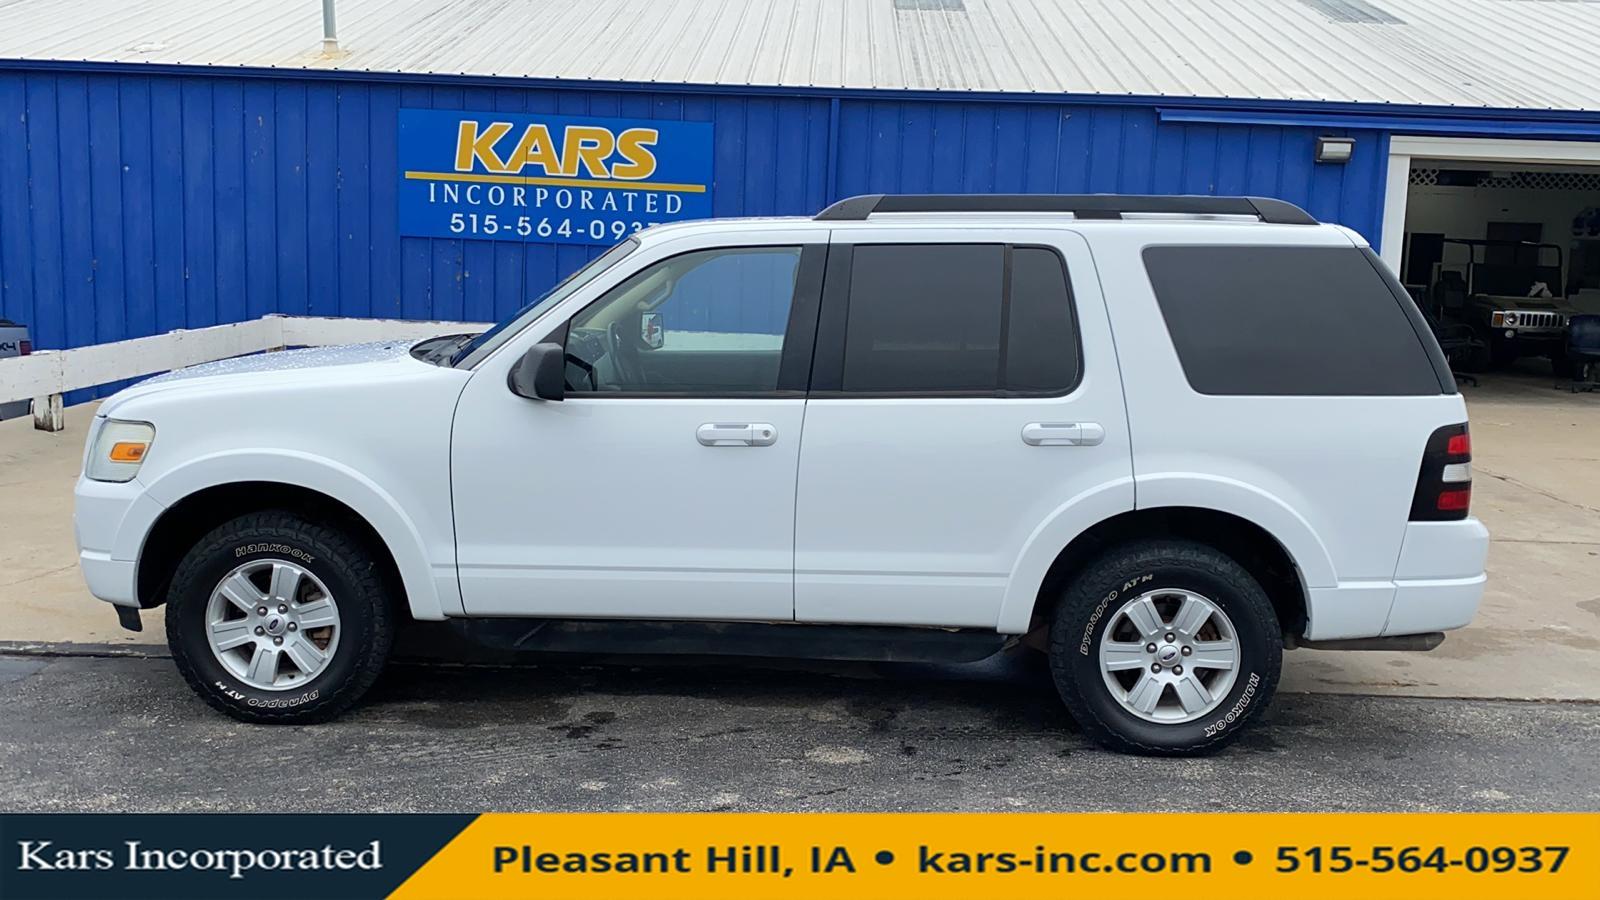 2010 Ford Explorer  - Kars Incorporated